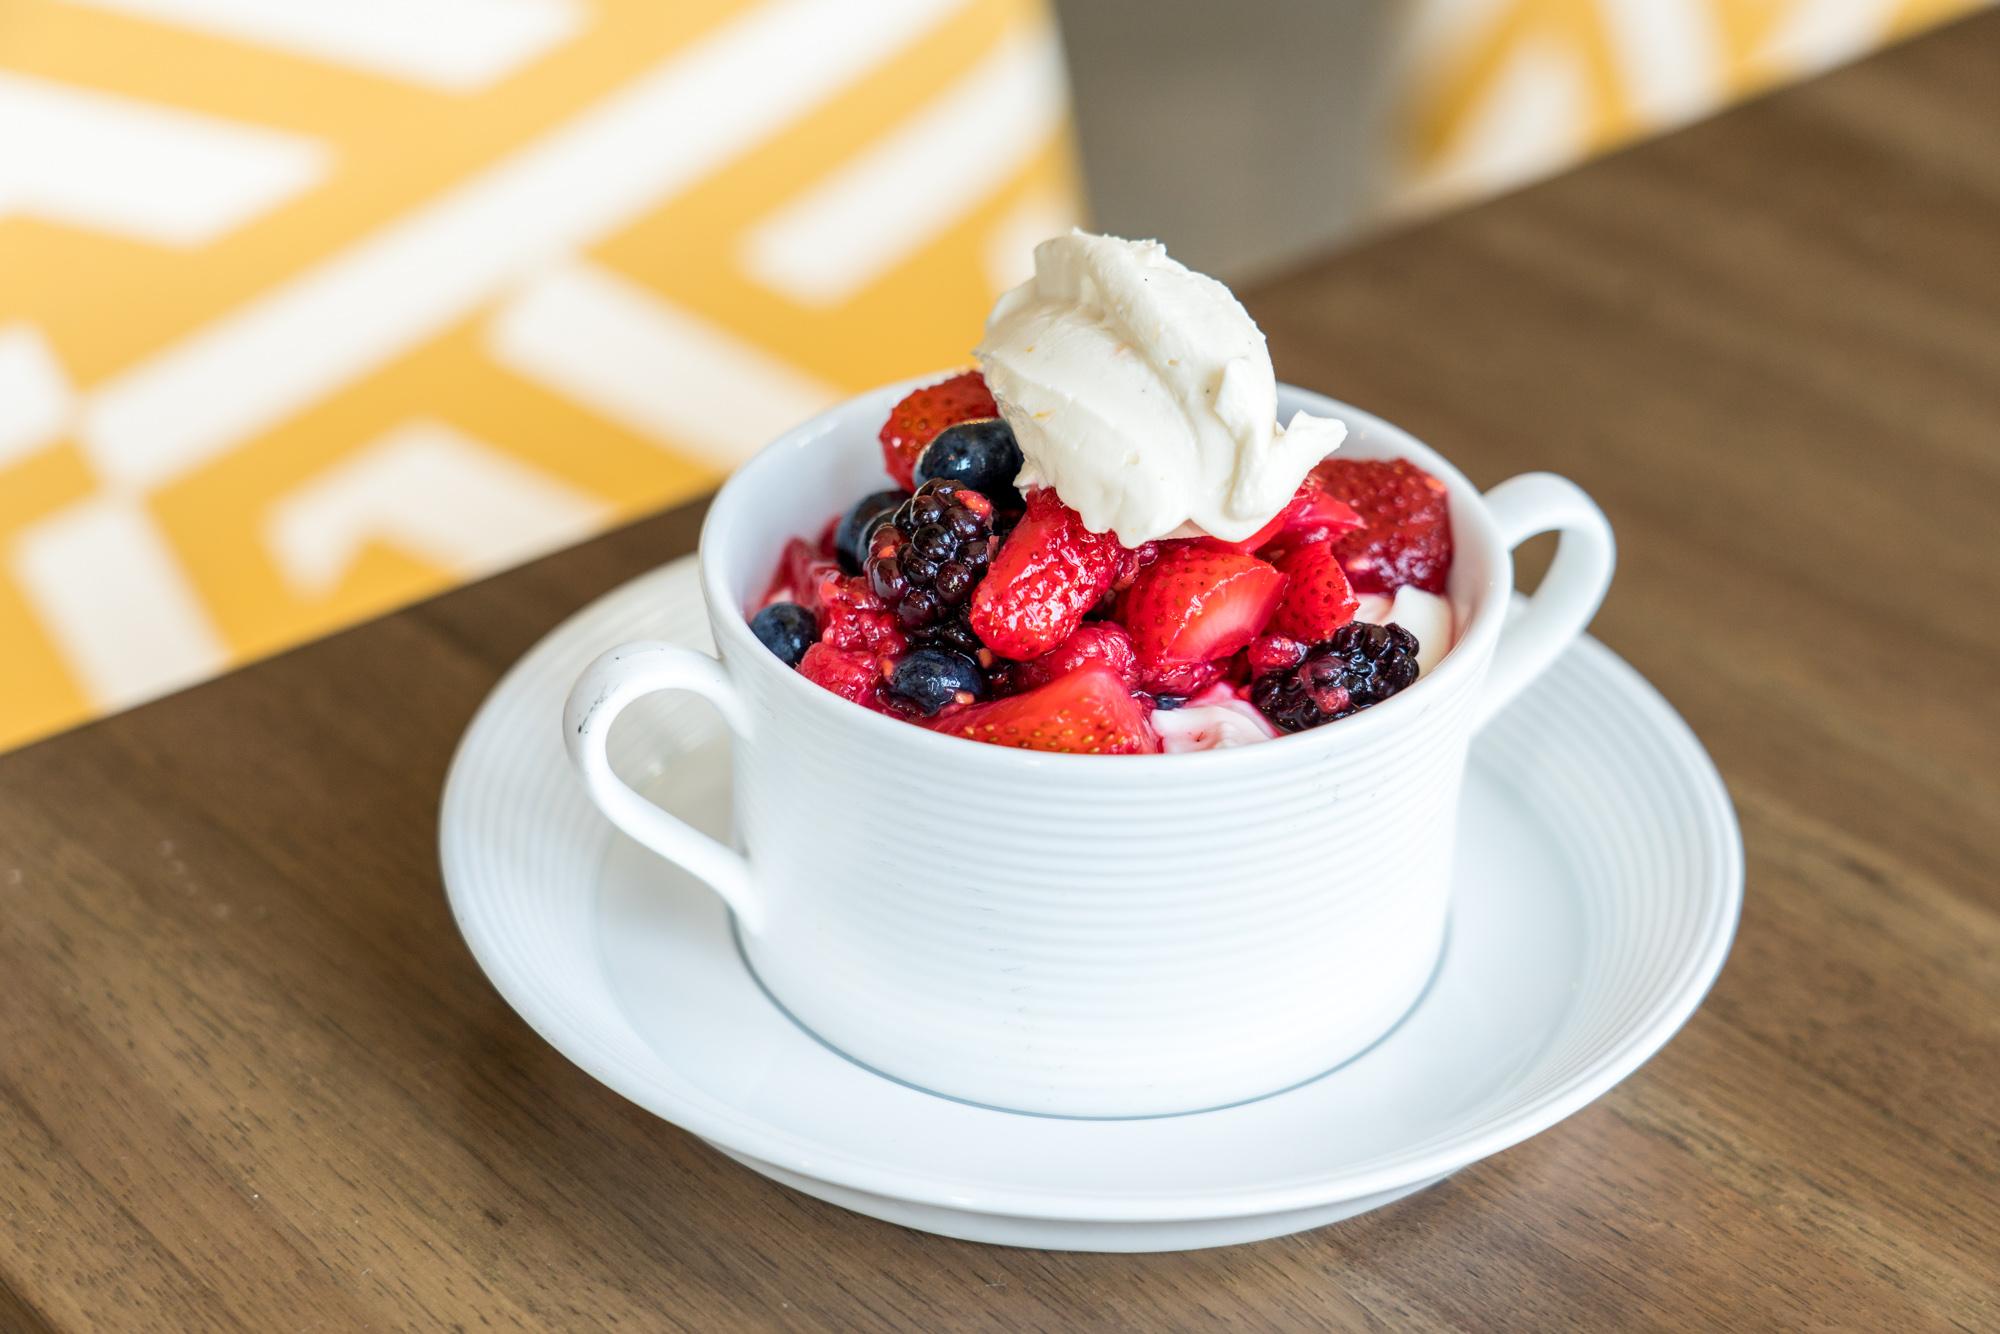 Greek Yogurt Parfait, Blonde Restaurant at Inn at the Pier, Pismo Beach, CA